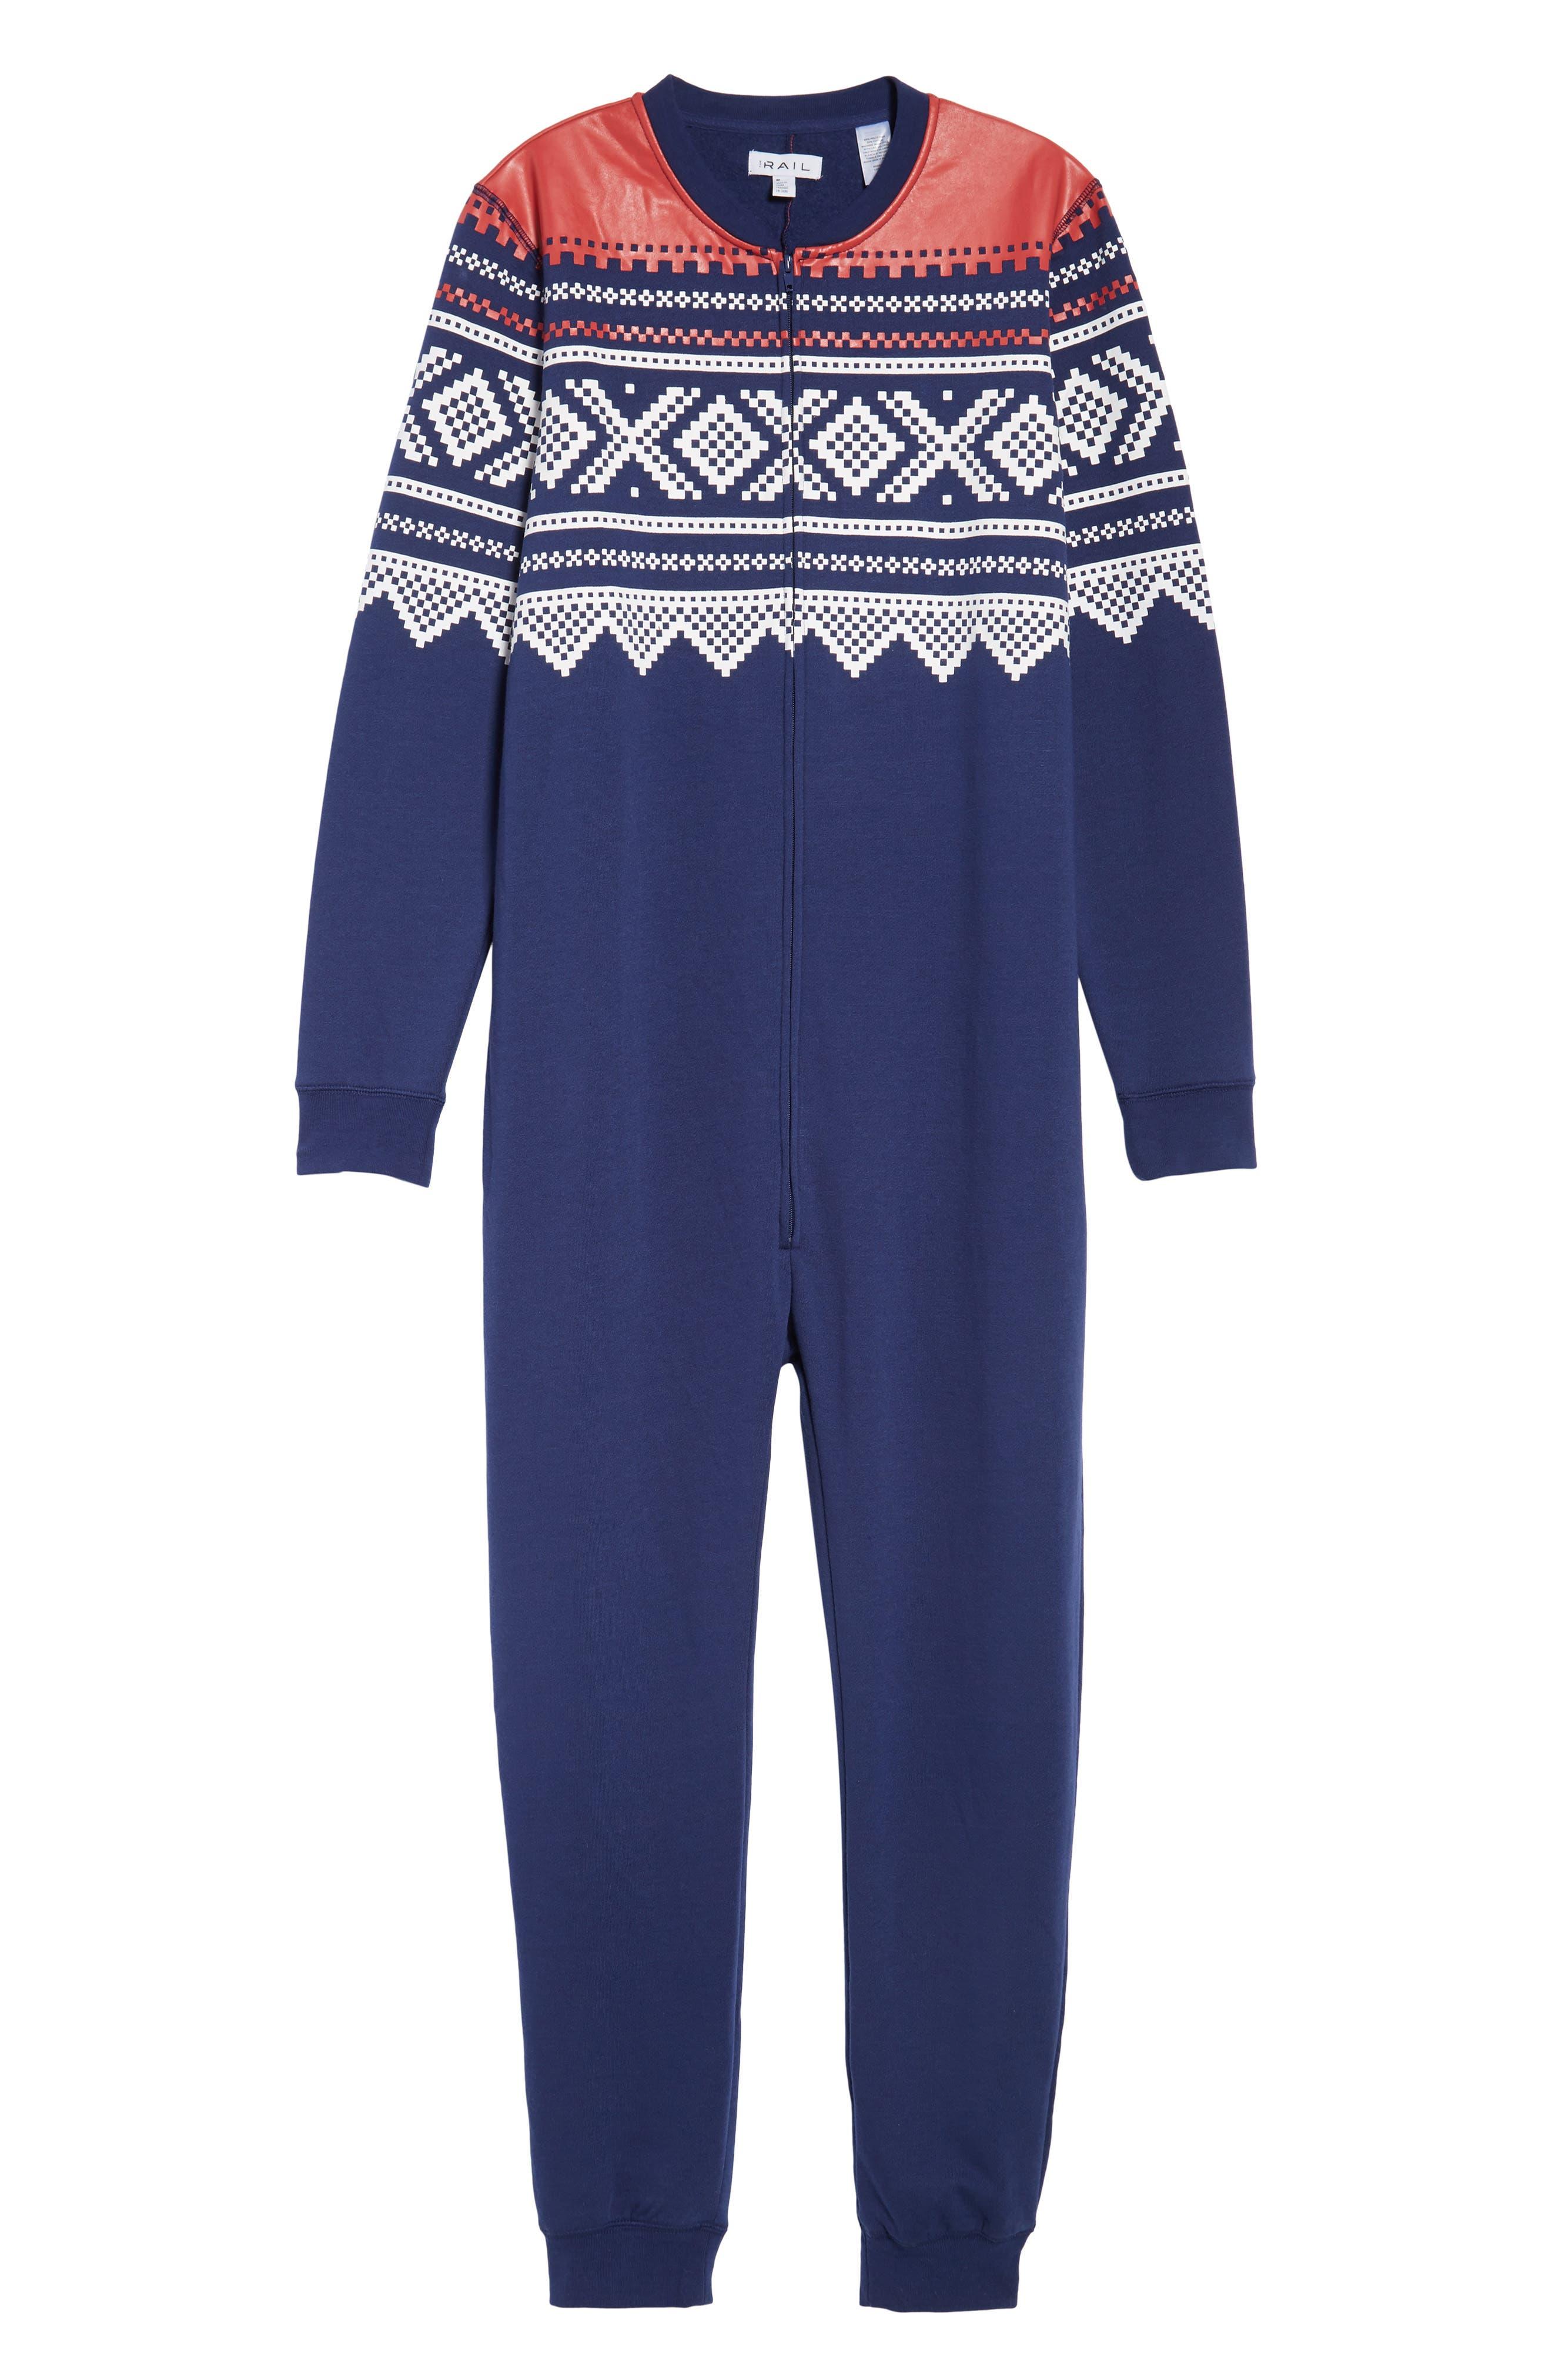 Fleece One-Piece Pajamas,                             Alternate thumbnail 6, color,                             040